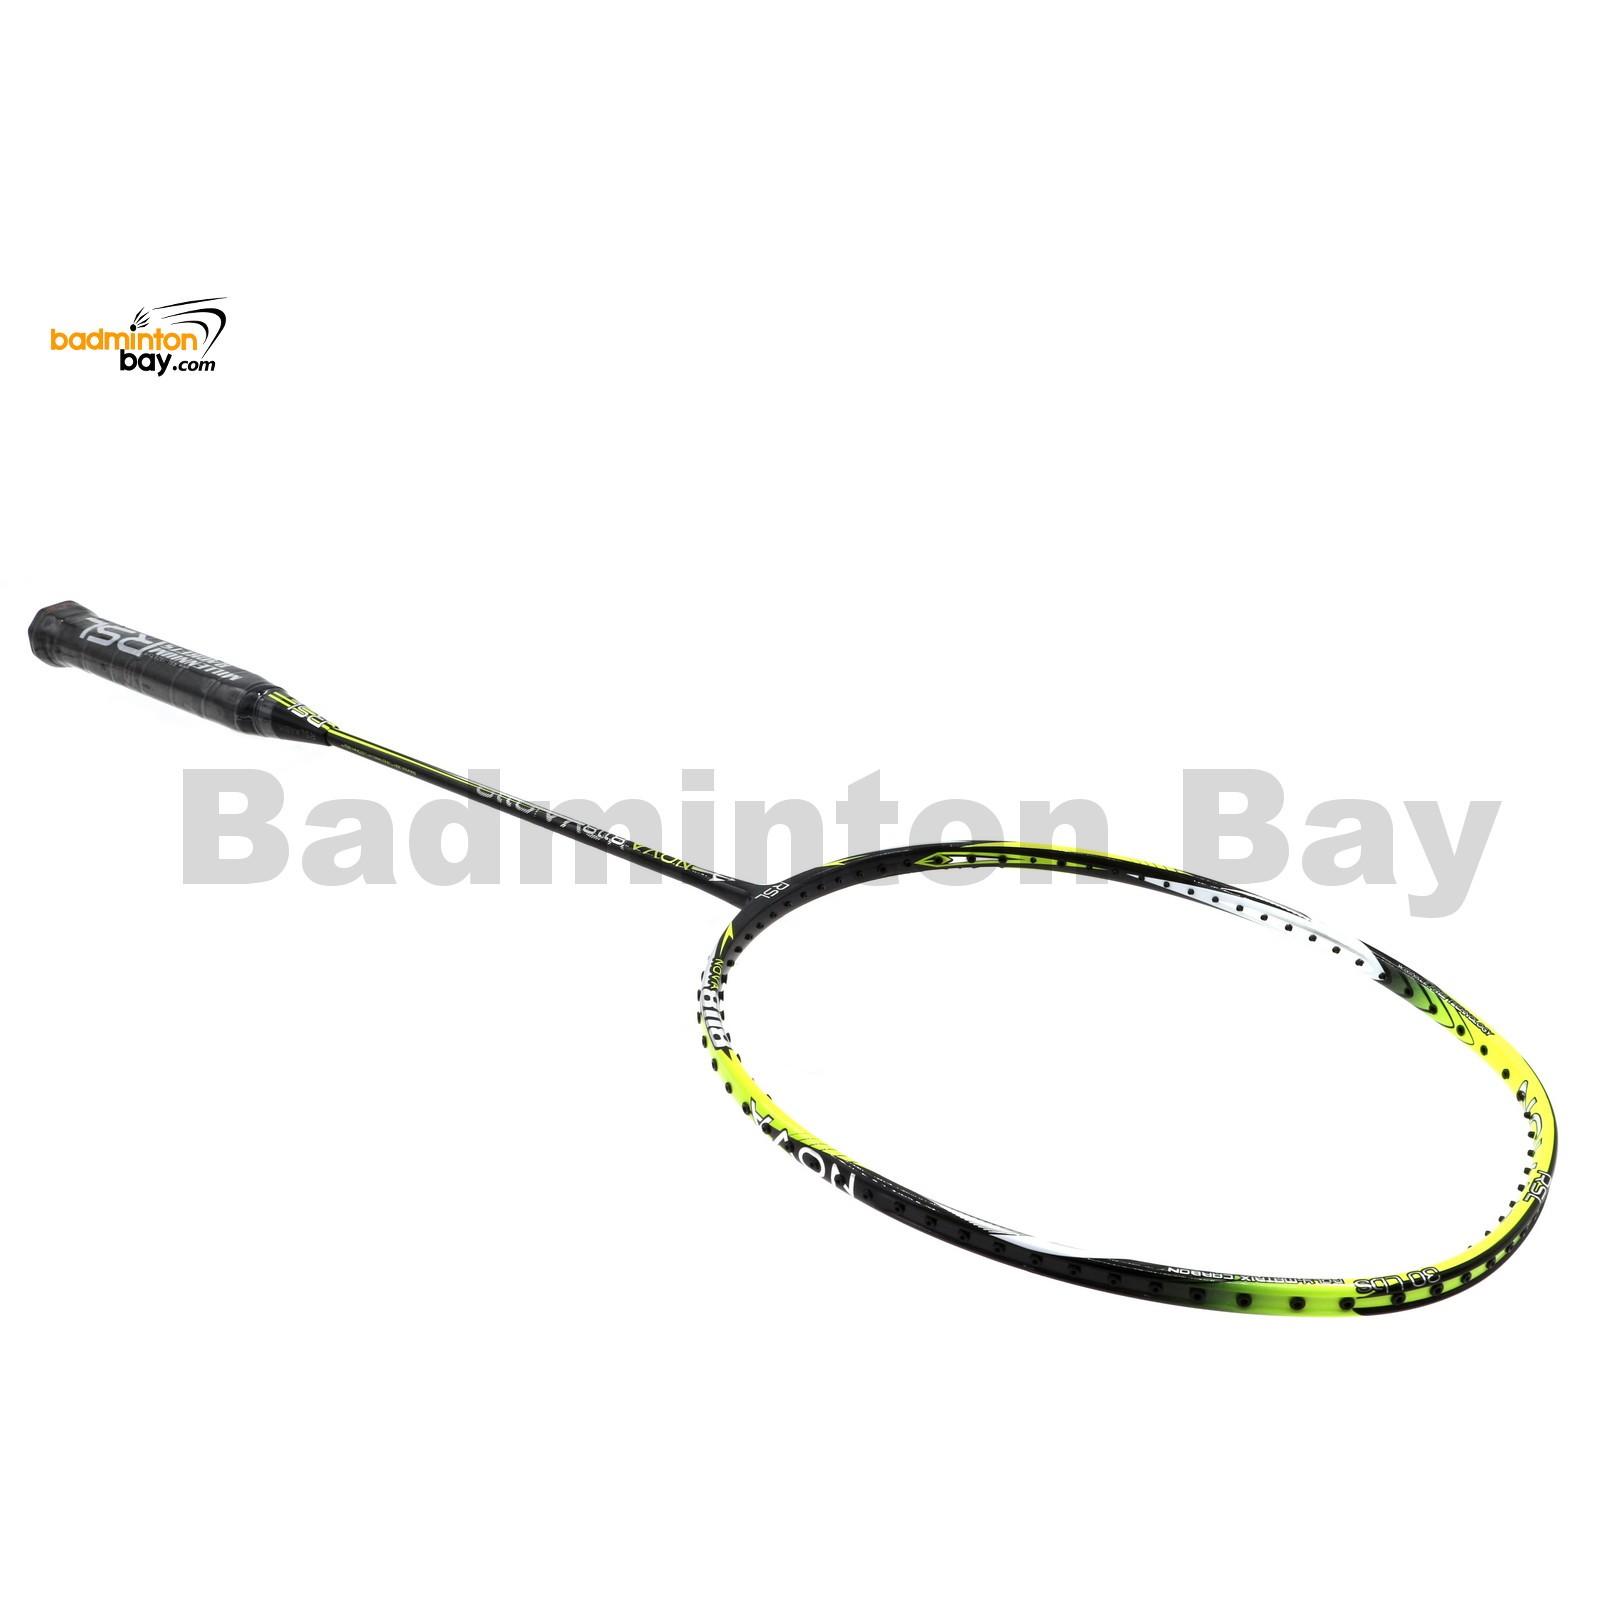 Rsl Nova Lime Black Badminton Racket 4u G5